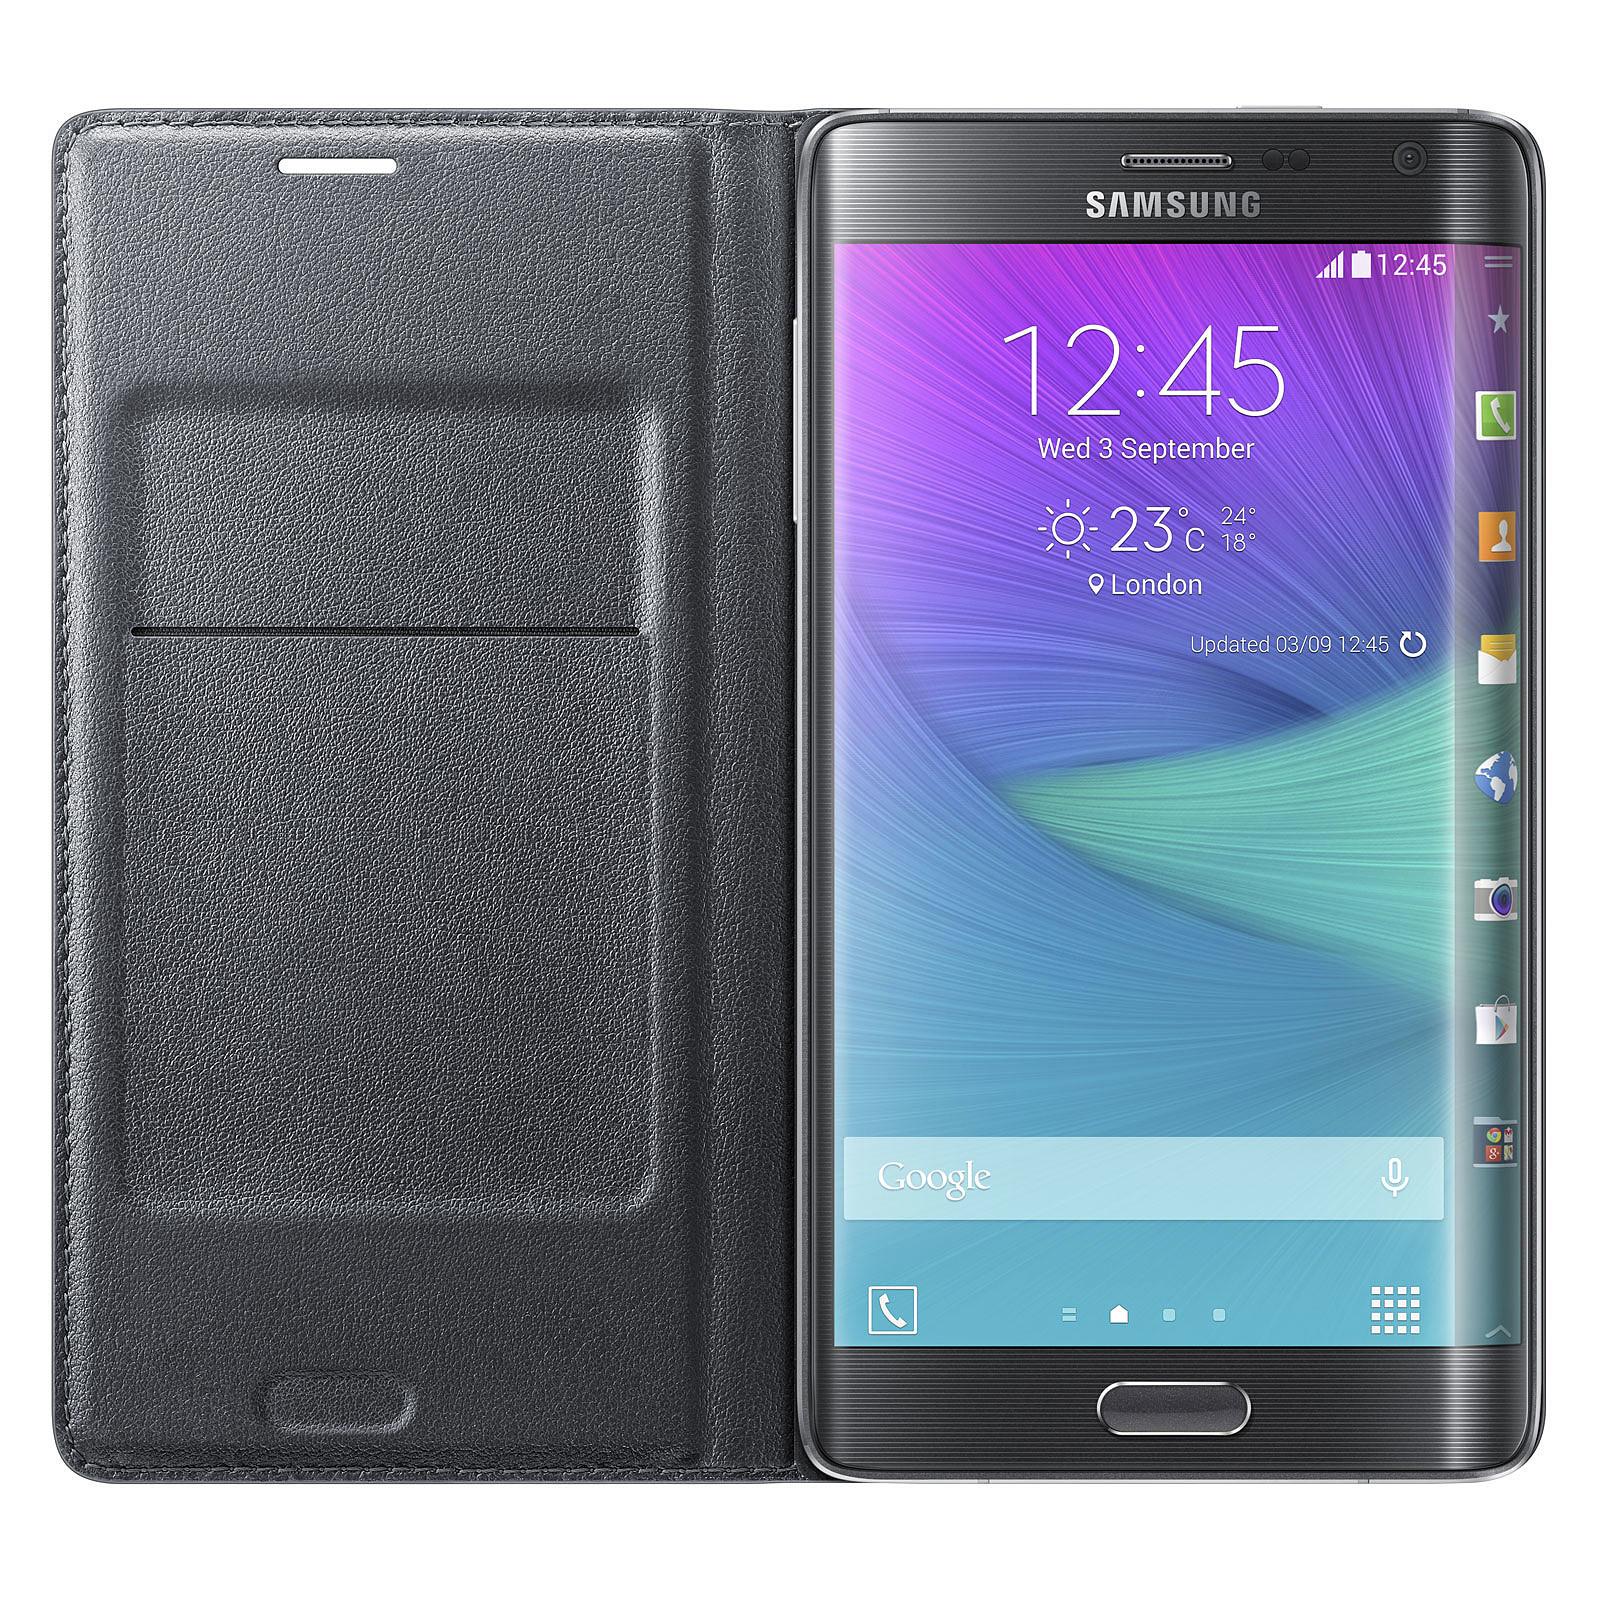 profiter du meilleur prix magasin britannique énorme inventaire Samsung Flip Wallet Noir Samsung Galaxy Note Edge - Coque ...